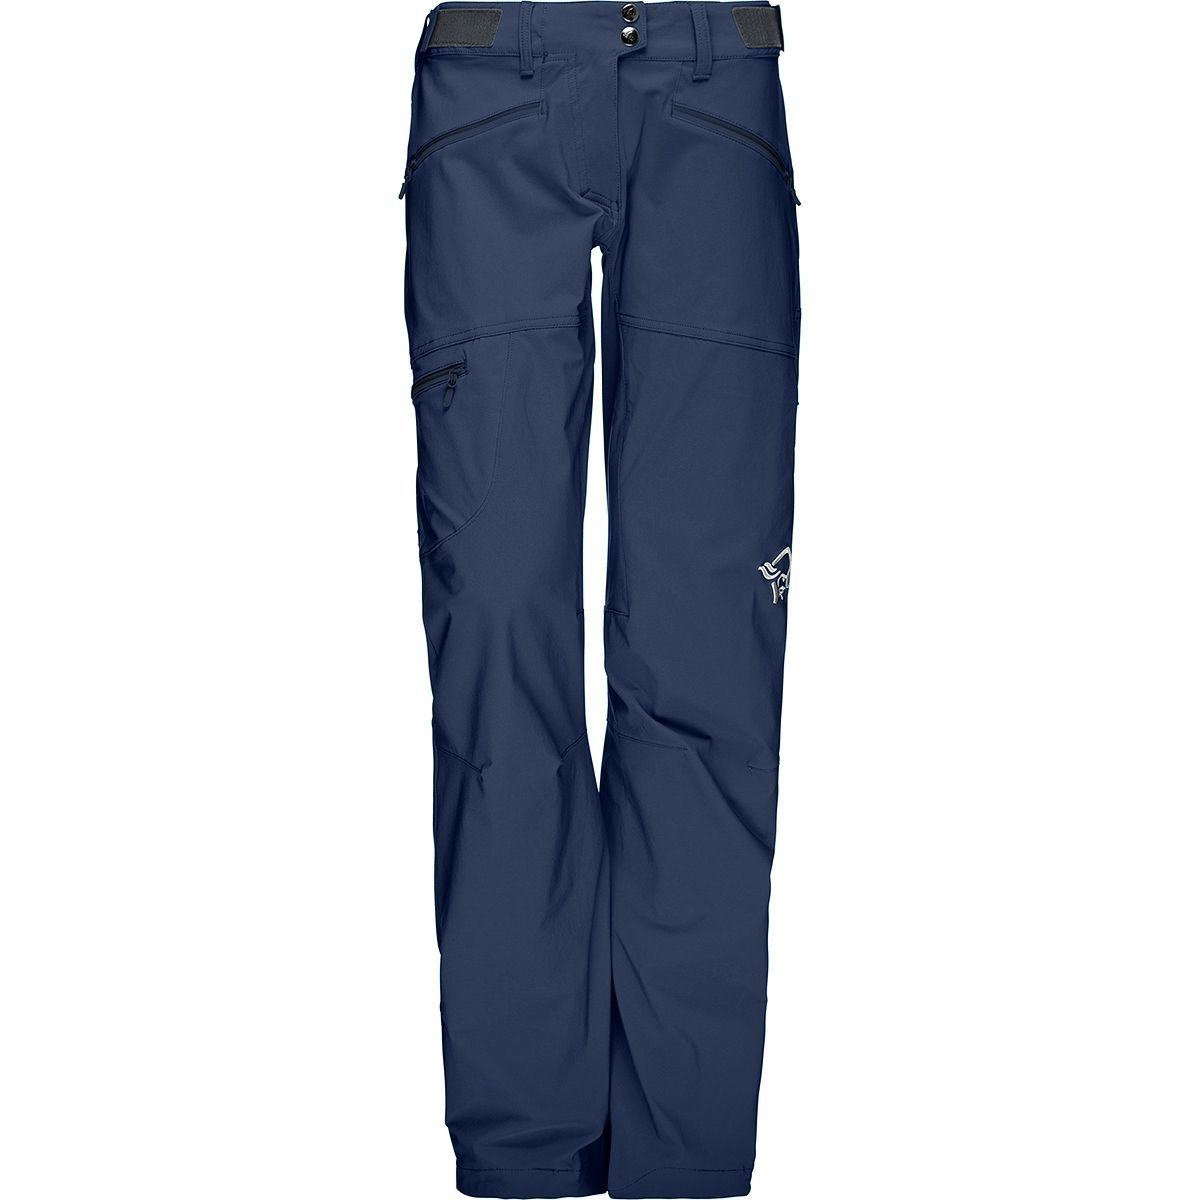 Norrona Falketind Flex1 Softshell Pant - Women's